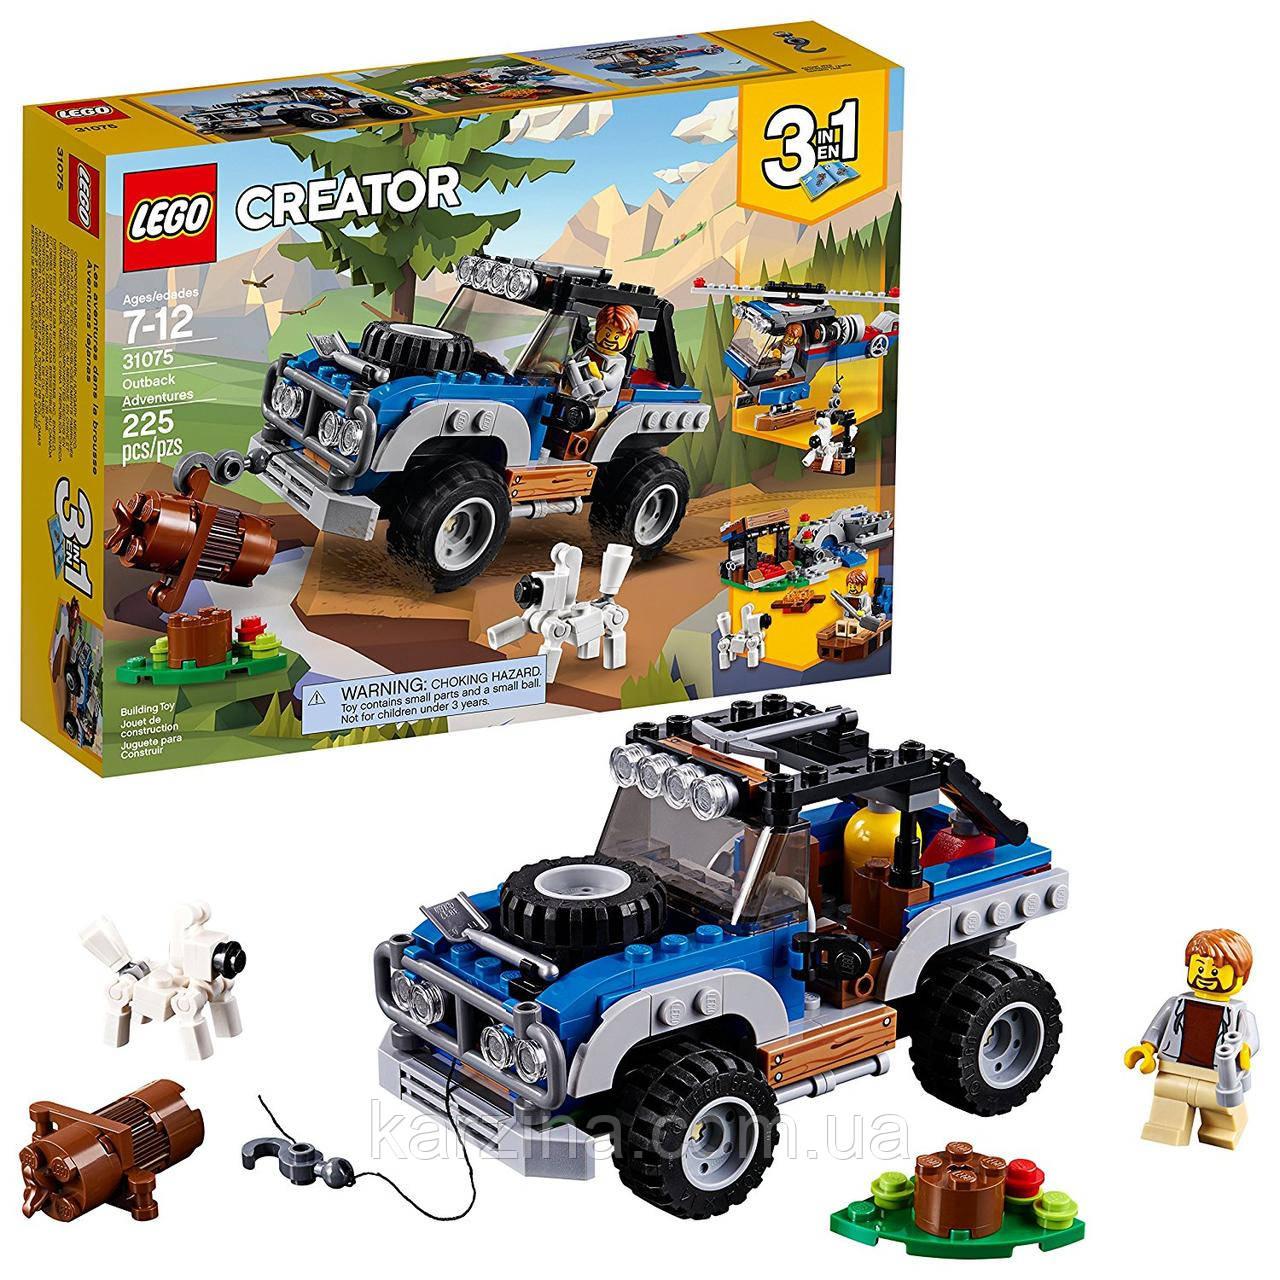 Конструктор LEGO Creator 3in1 31075